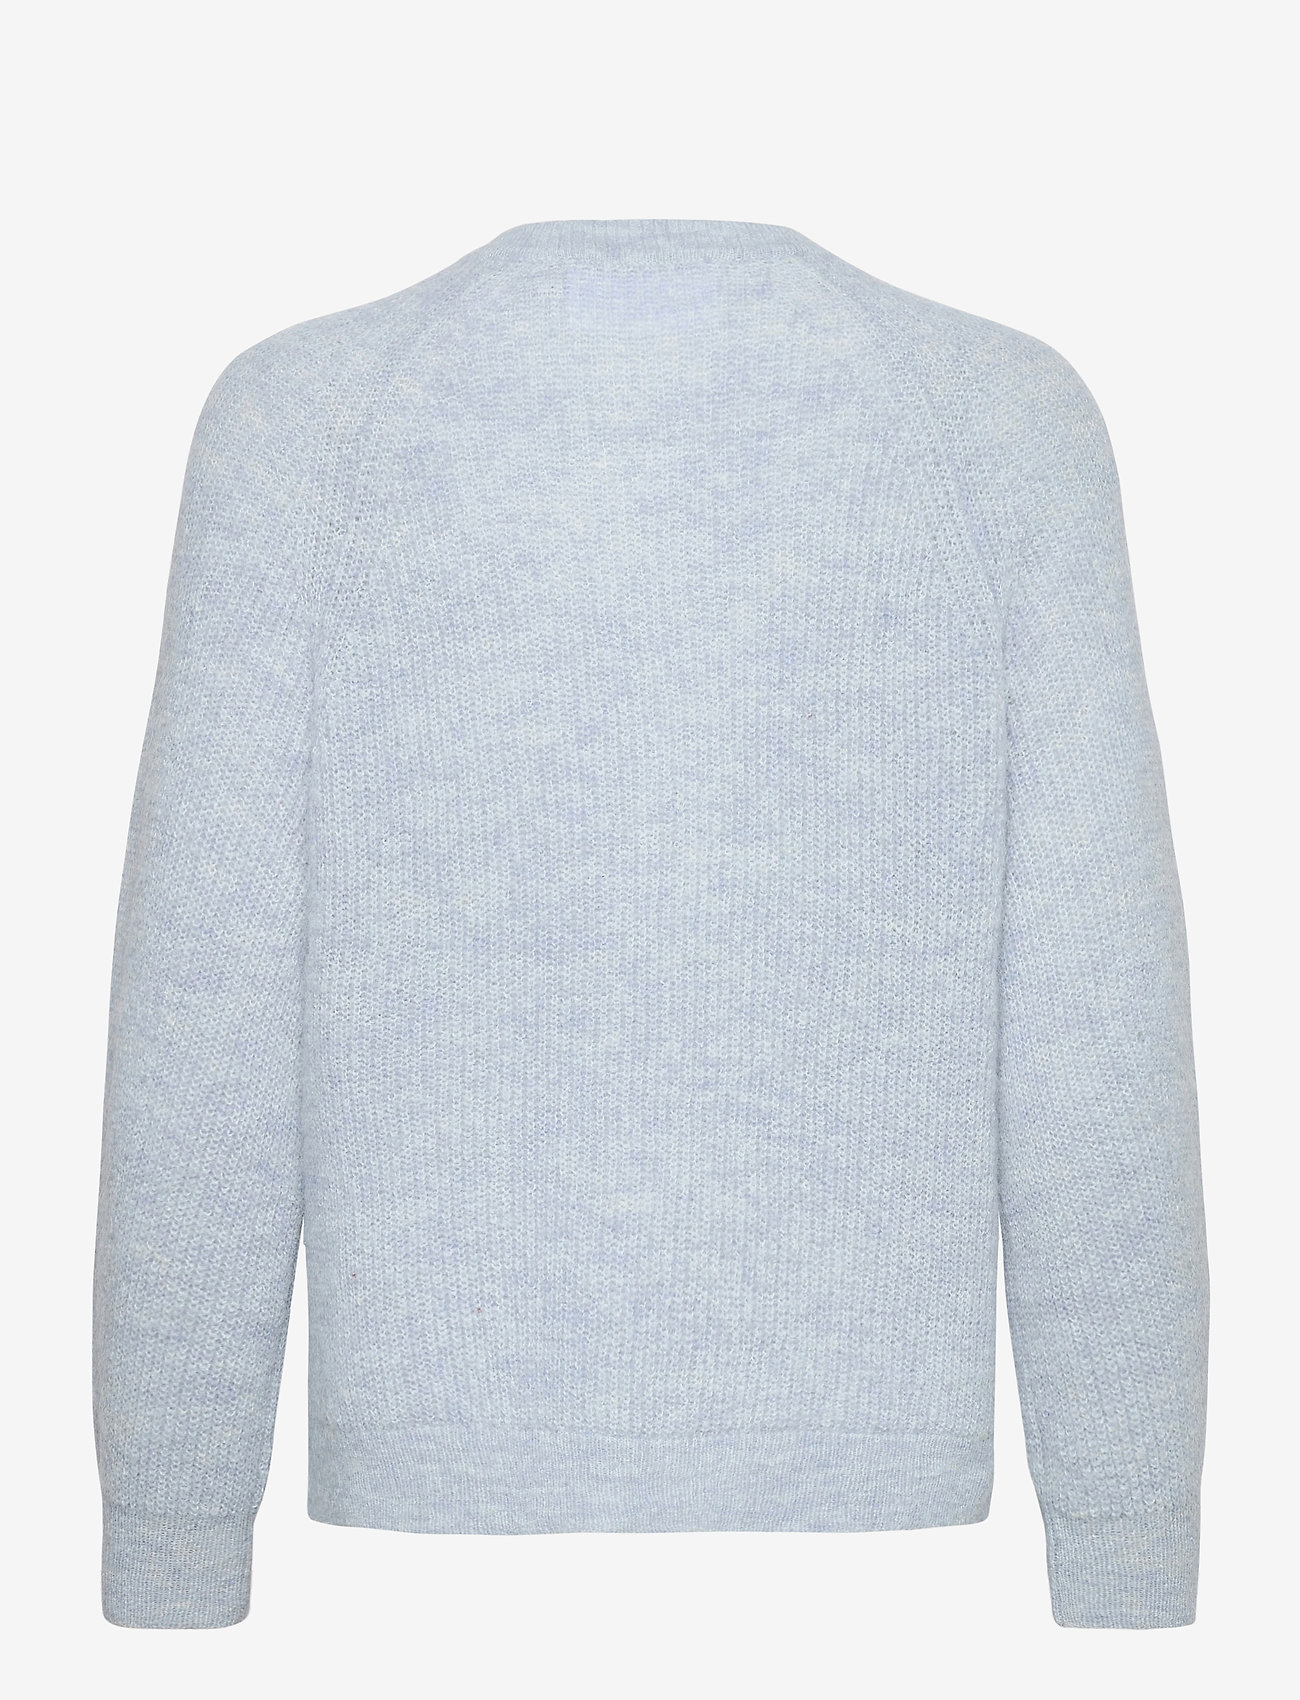 Selected Femme - SLFLULU LS KNIT SHORT CARDIGAN - cardigans - cashmere blue - 1